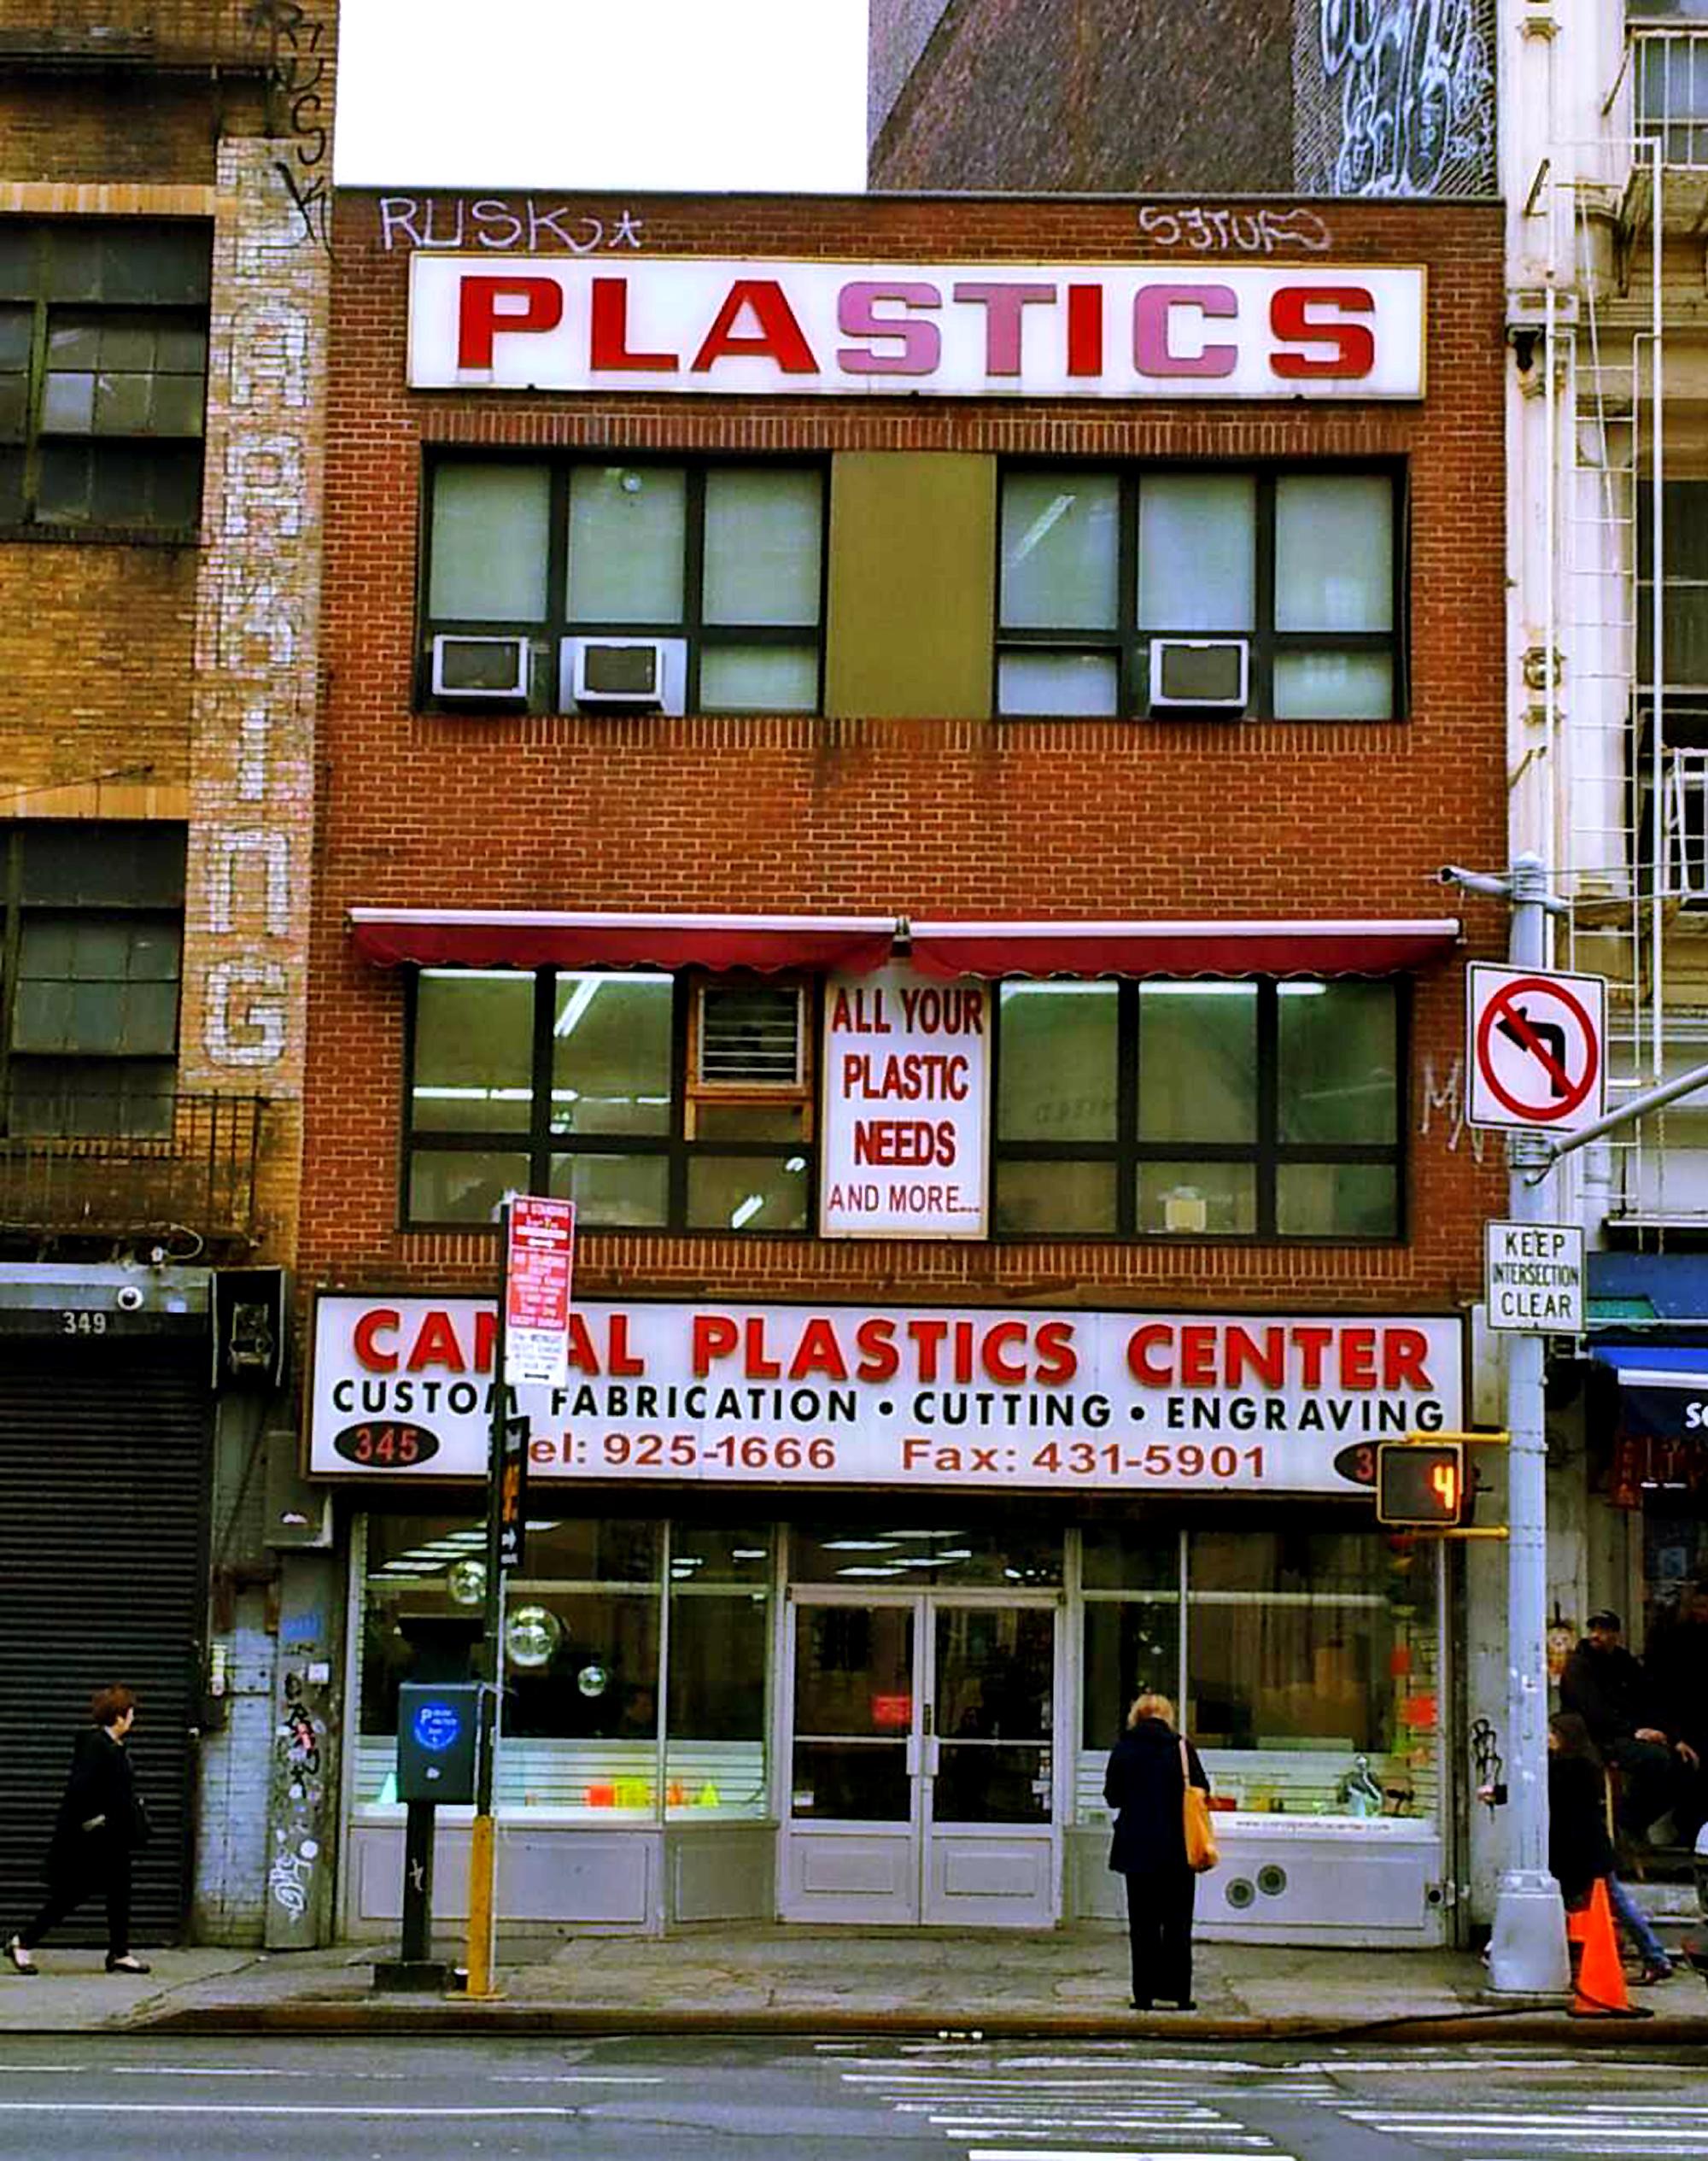 Canal Plastics